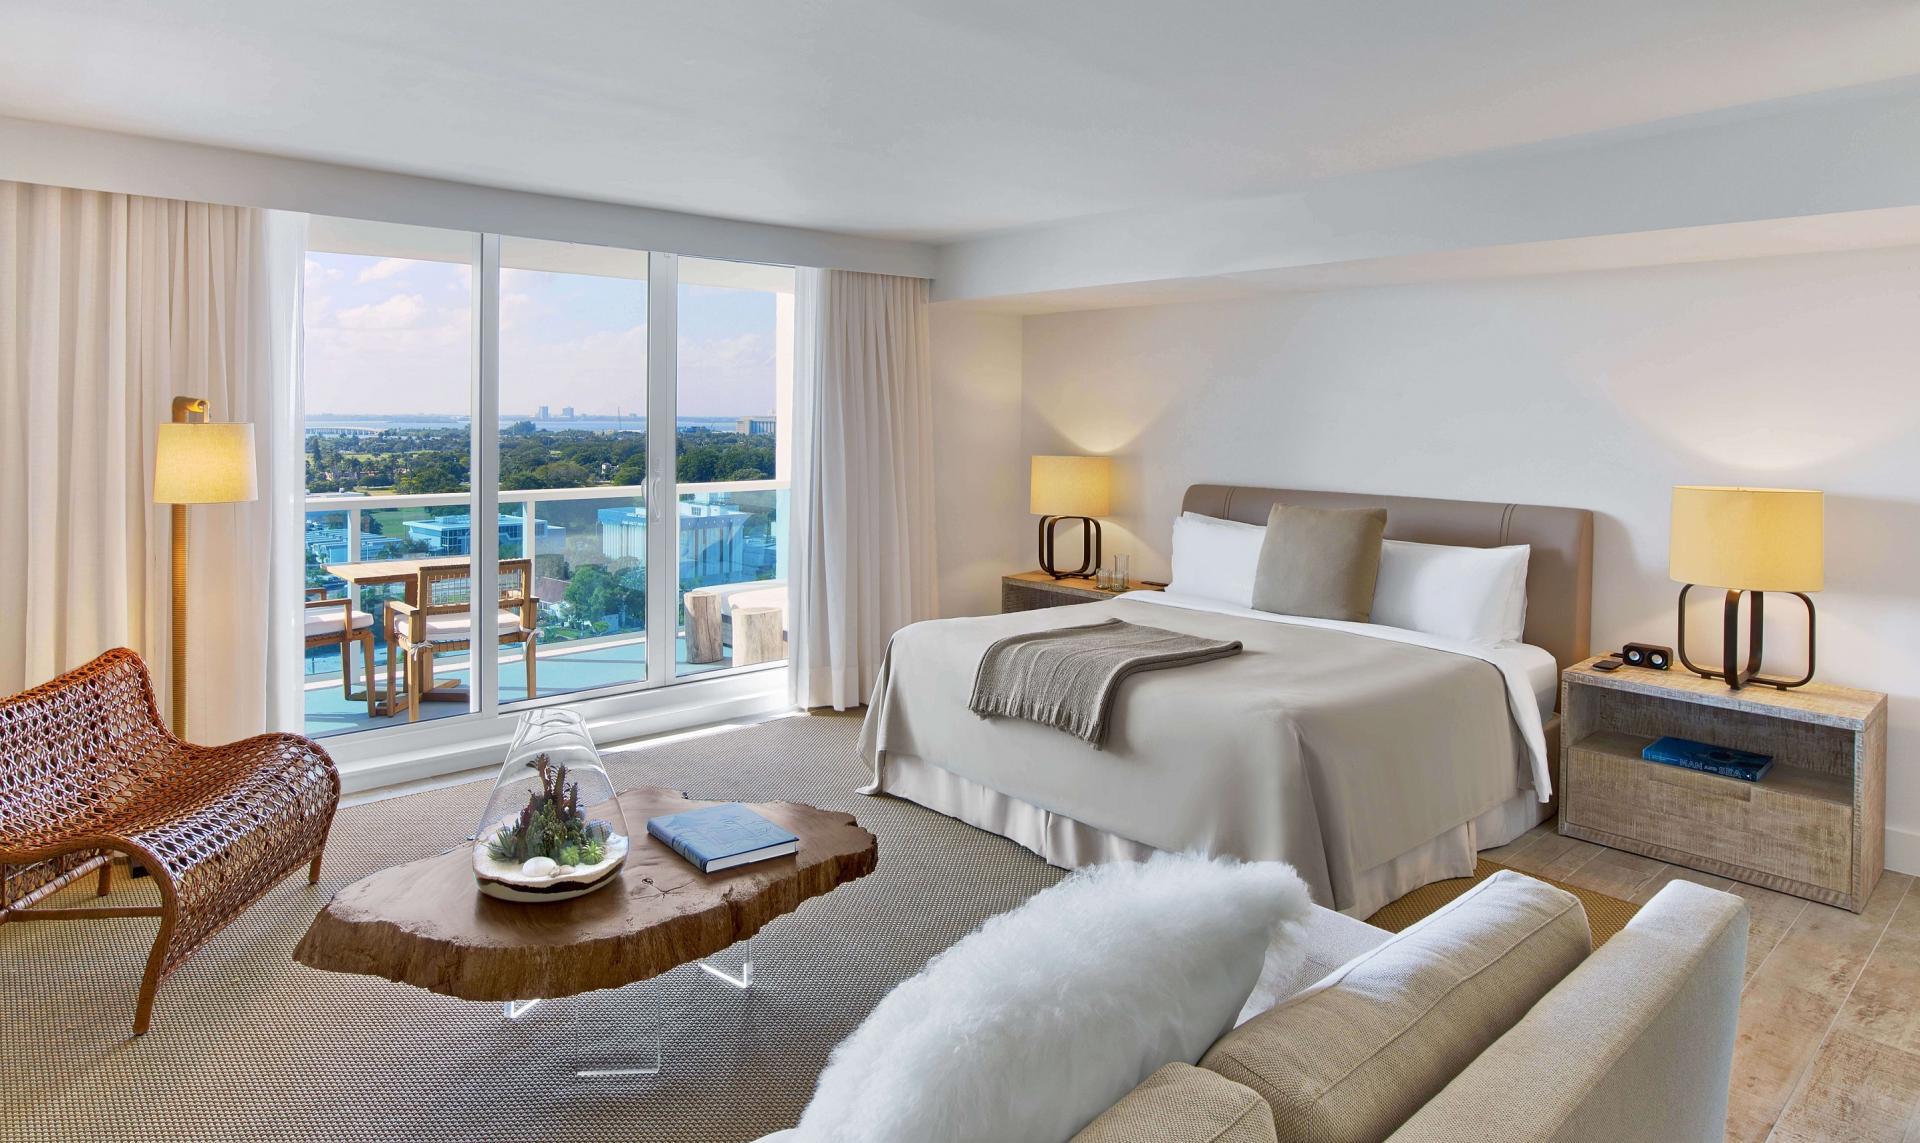 The Studio Suite with Balcony Room